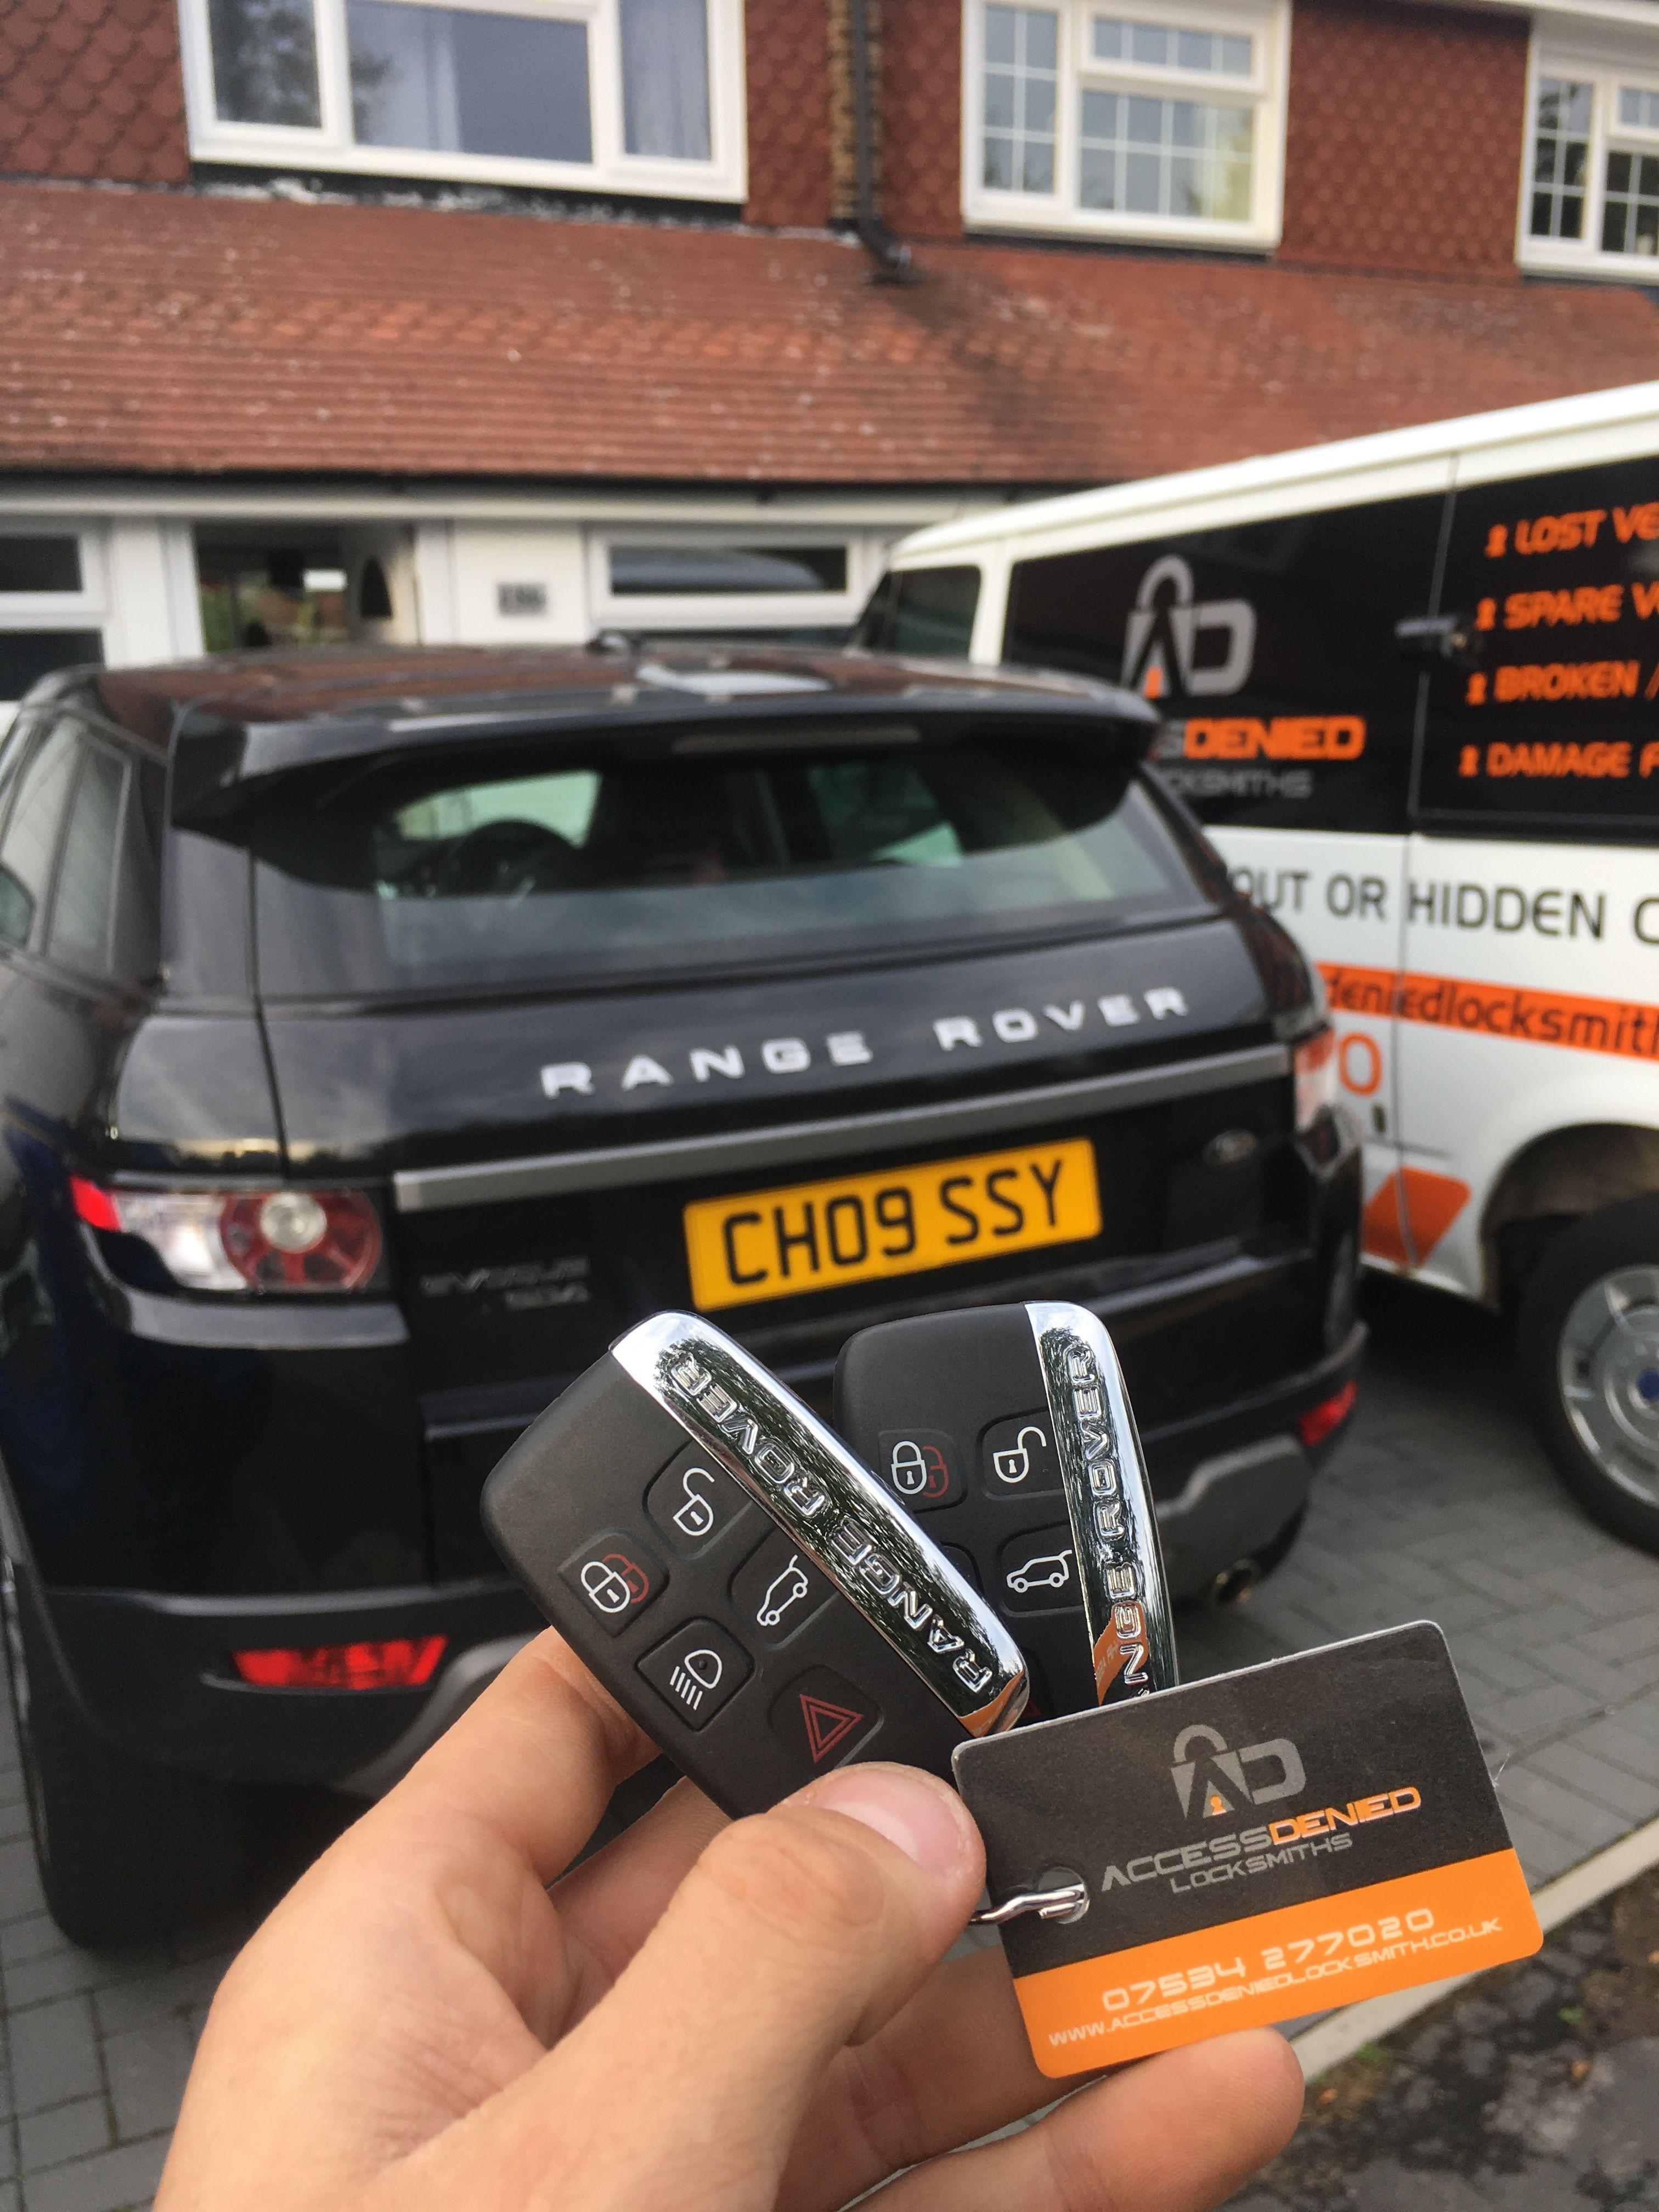 Range Rover Evoque 2012 Replacement Keys In Hoddesdon The